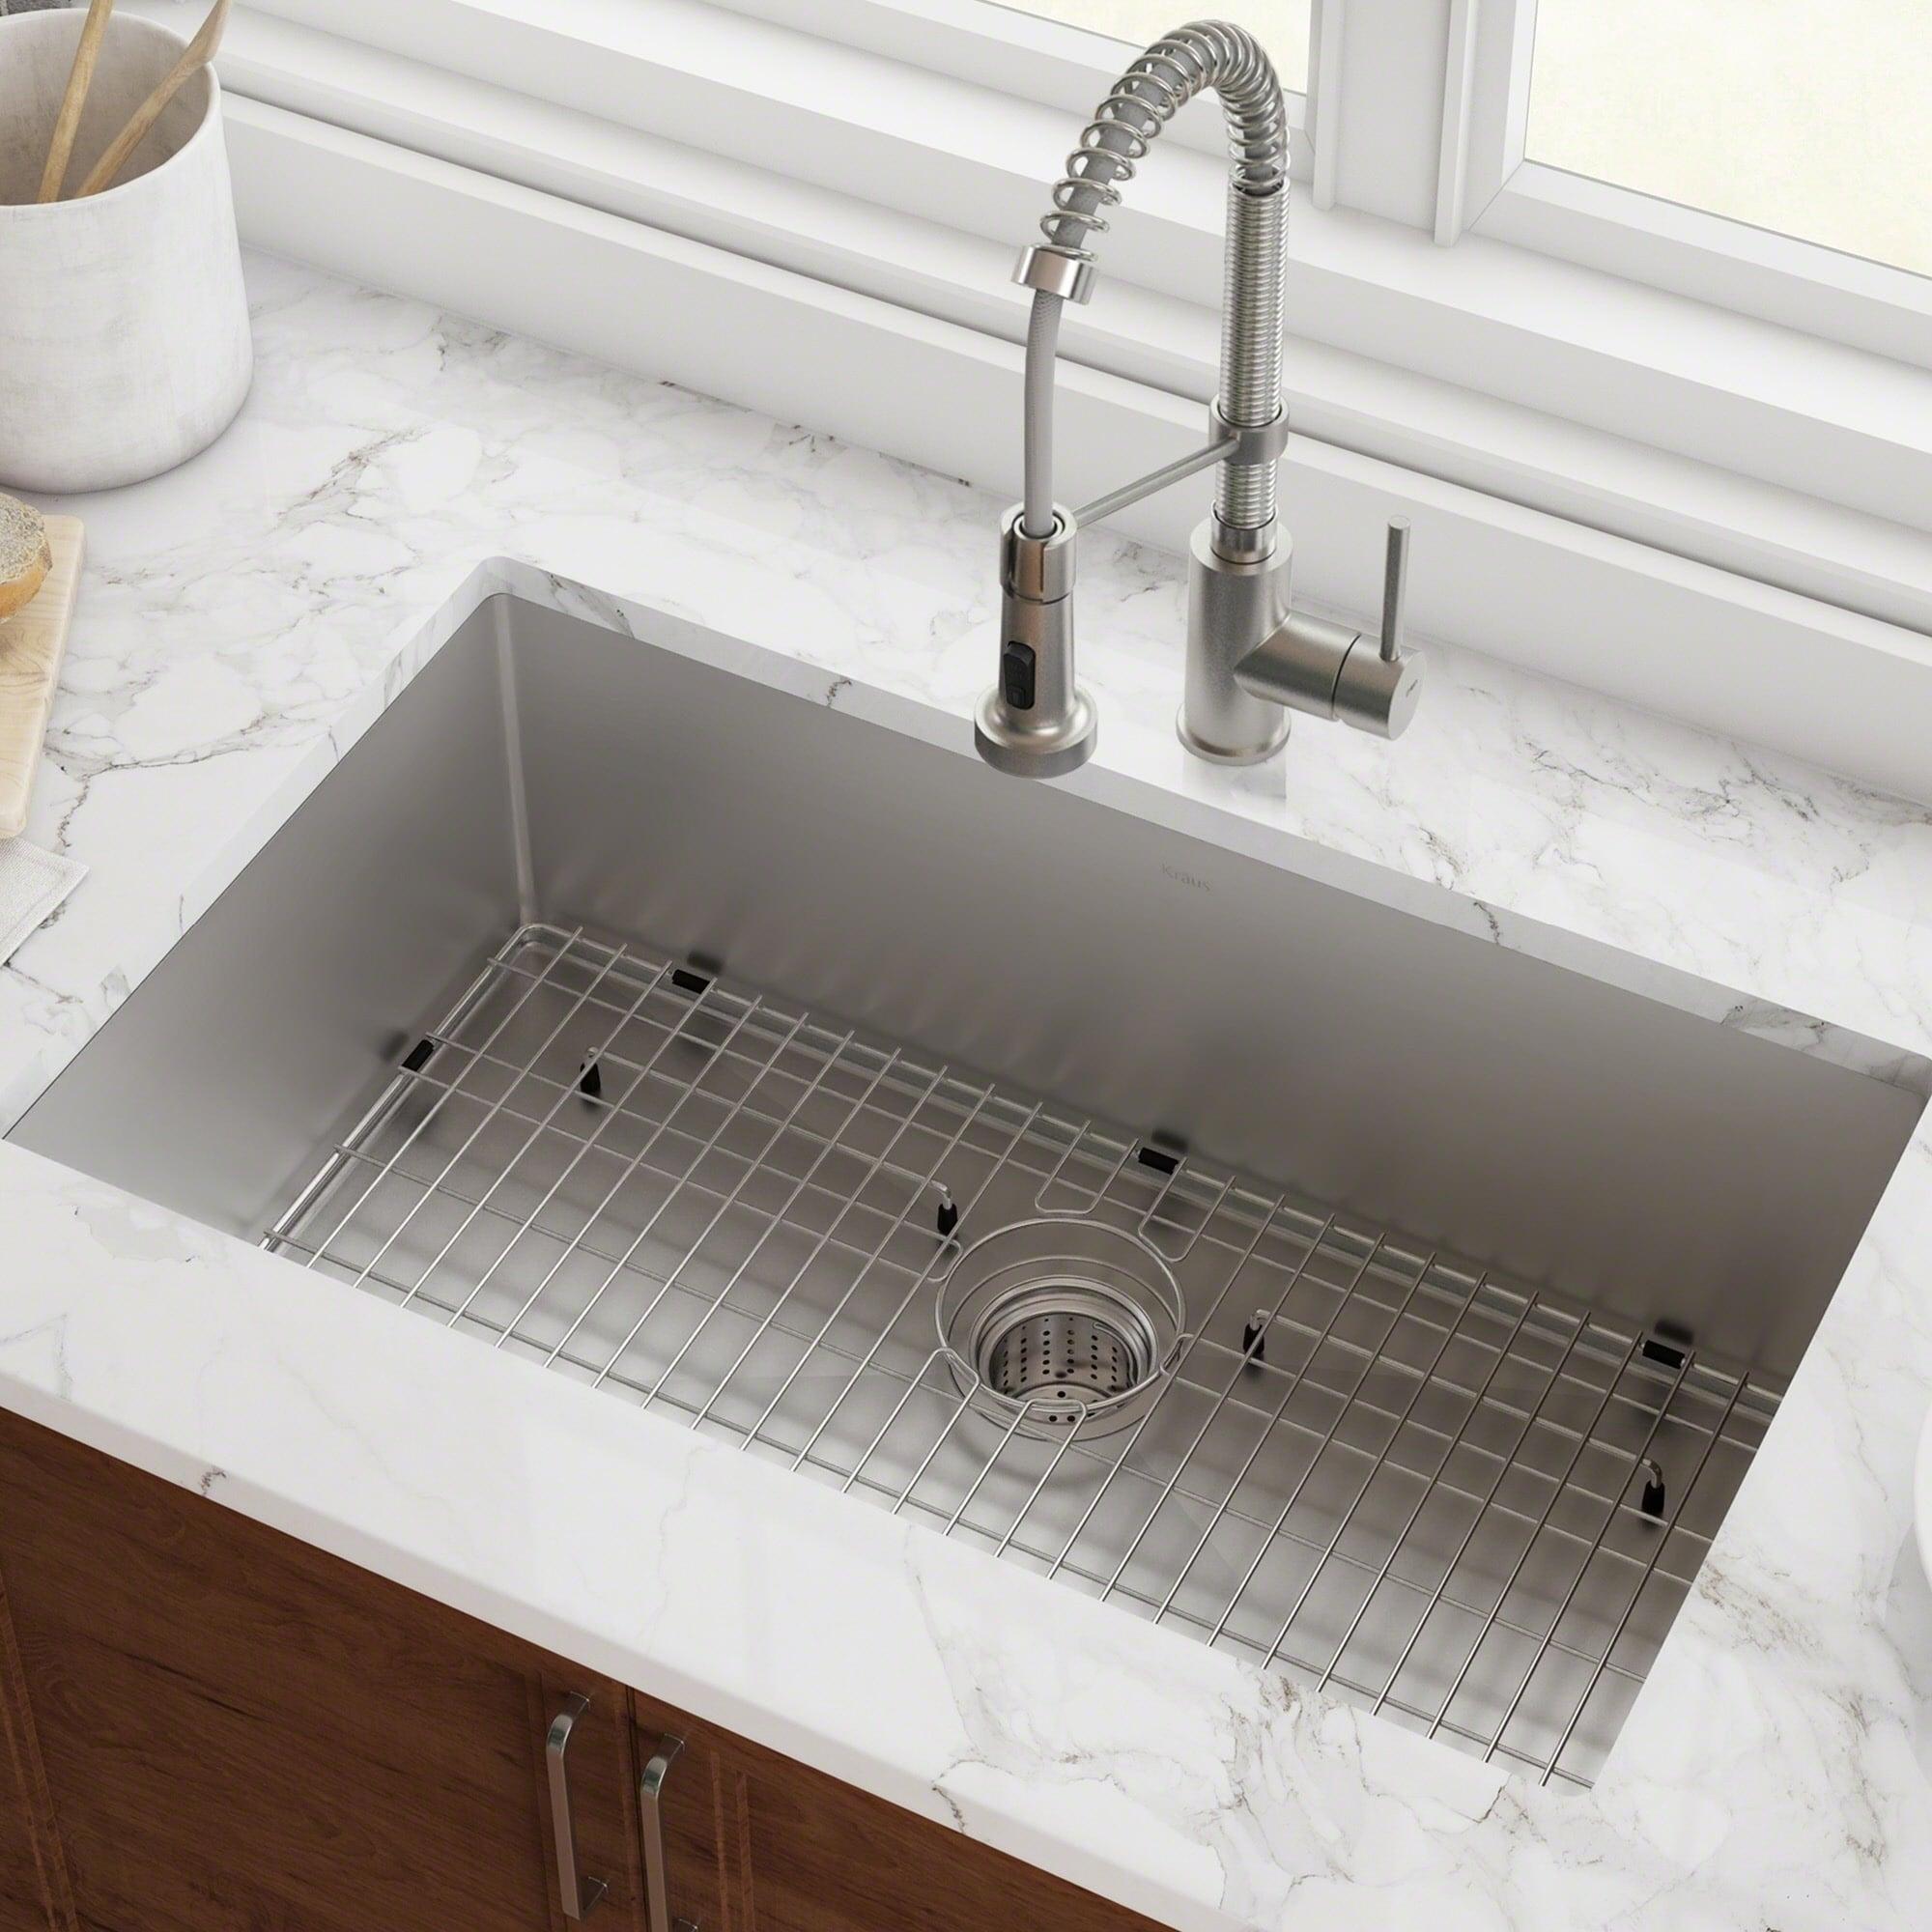 Sinks | Shop our Best Home Improvement Deals Online at Overstock.com